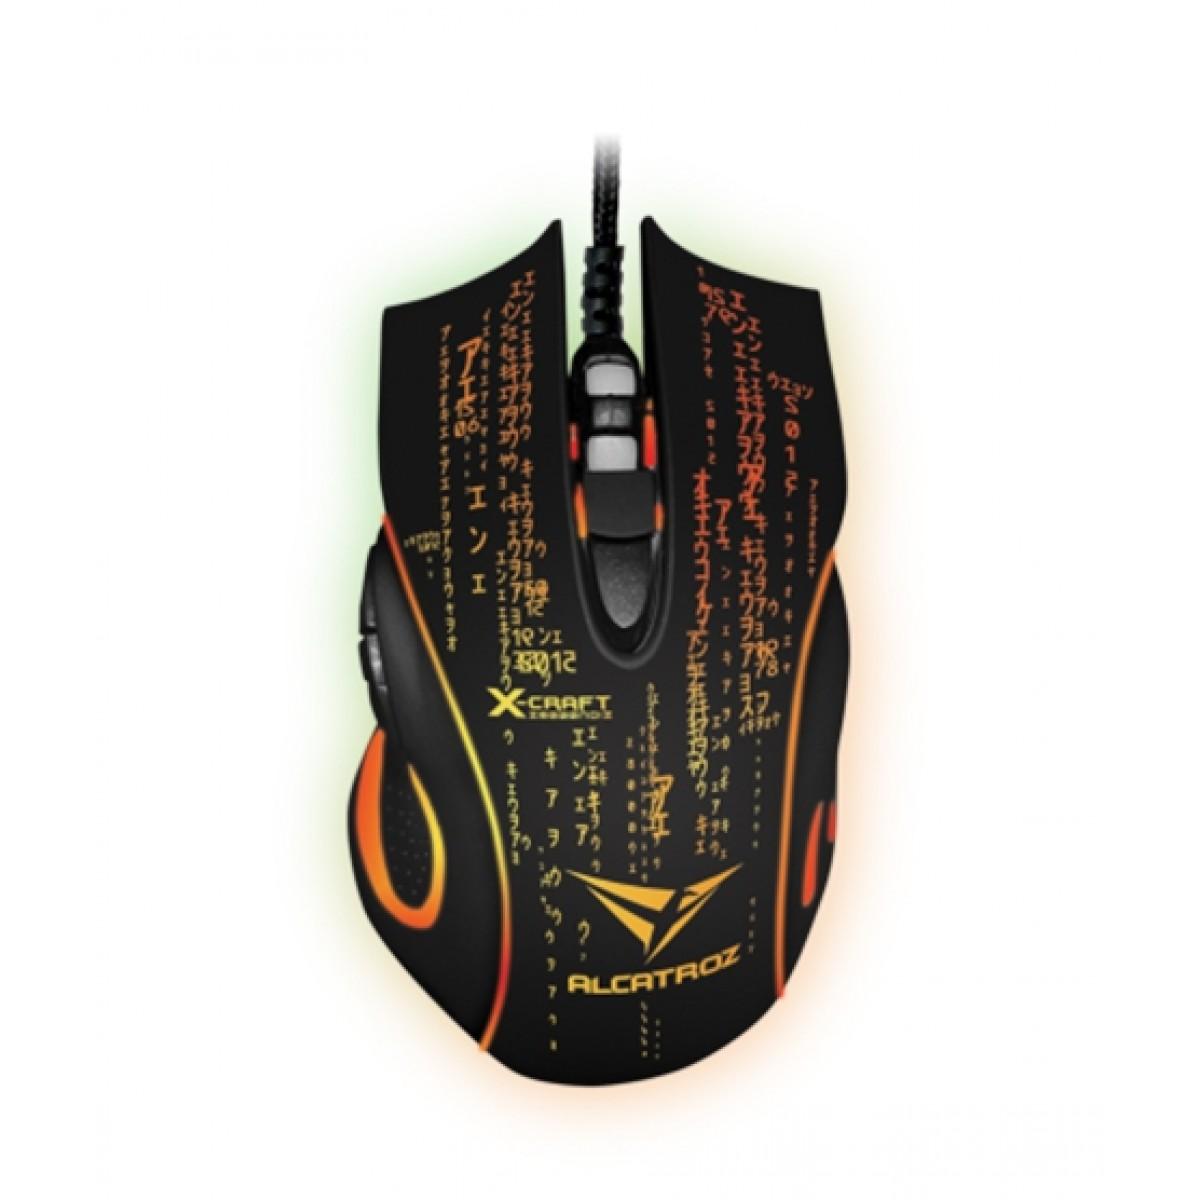 LeapFrog Alcatroz X-CRAFT Noiz Z8000 Gaming Mouse